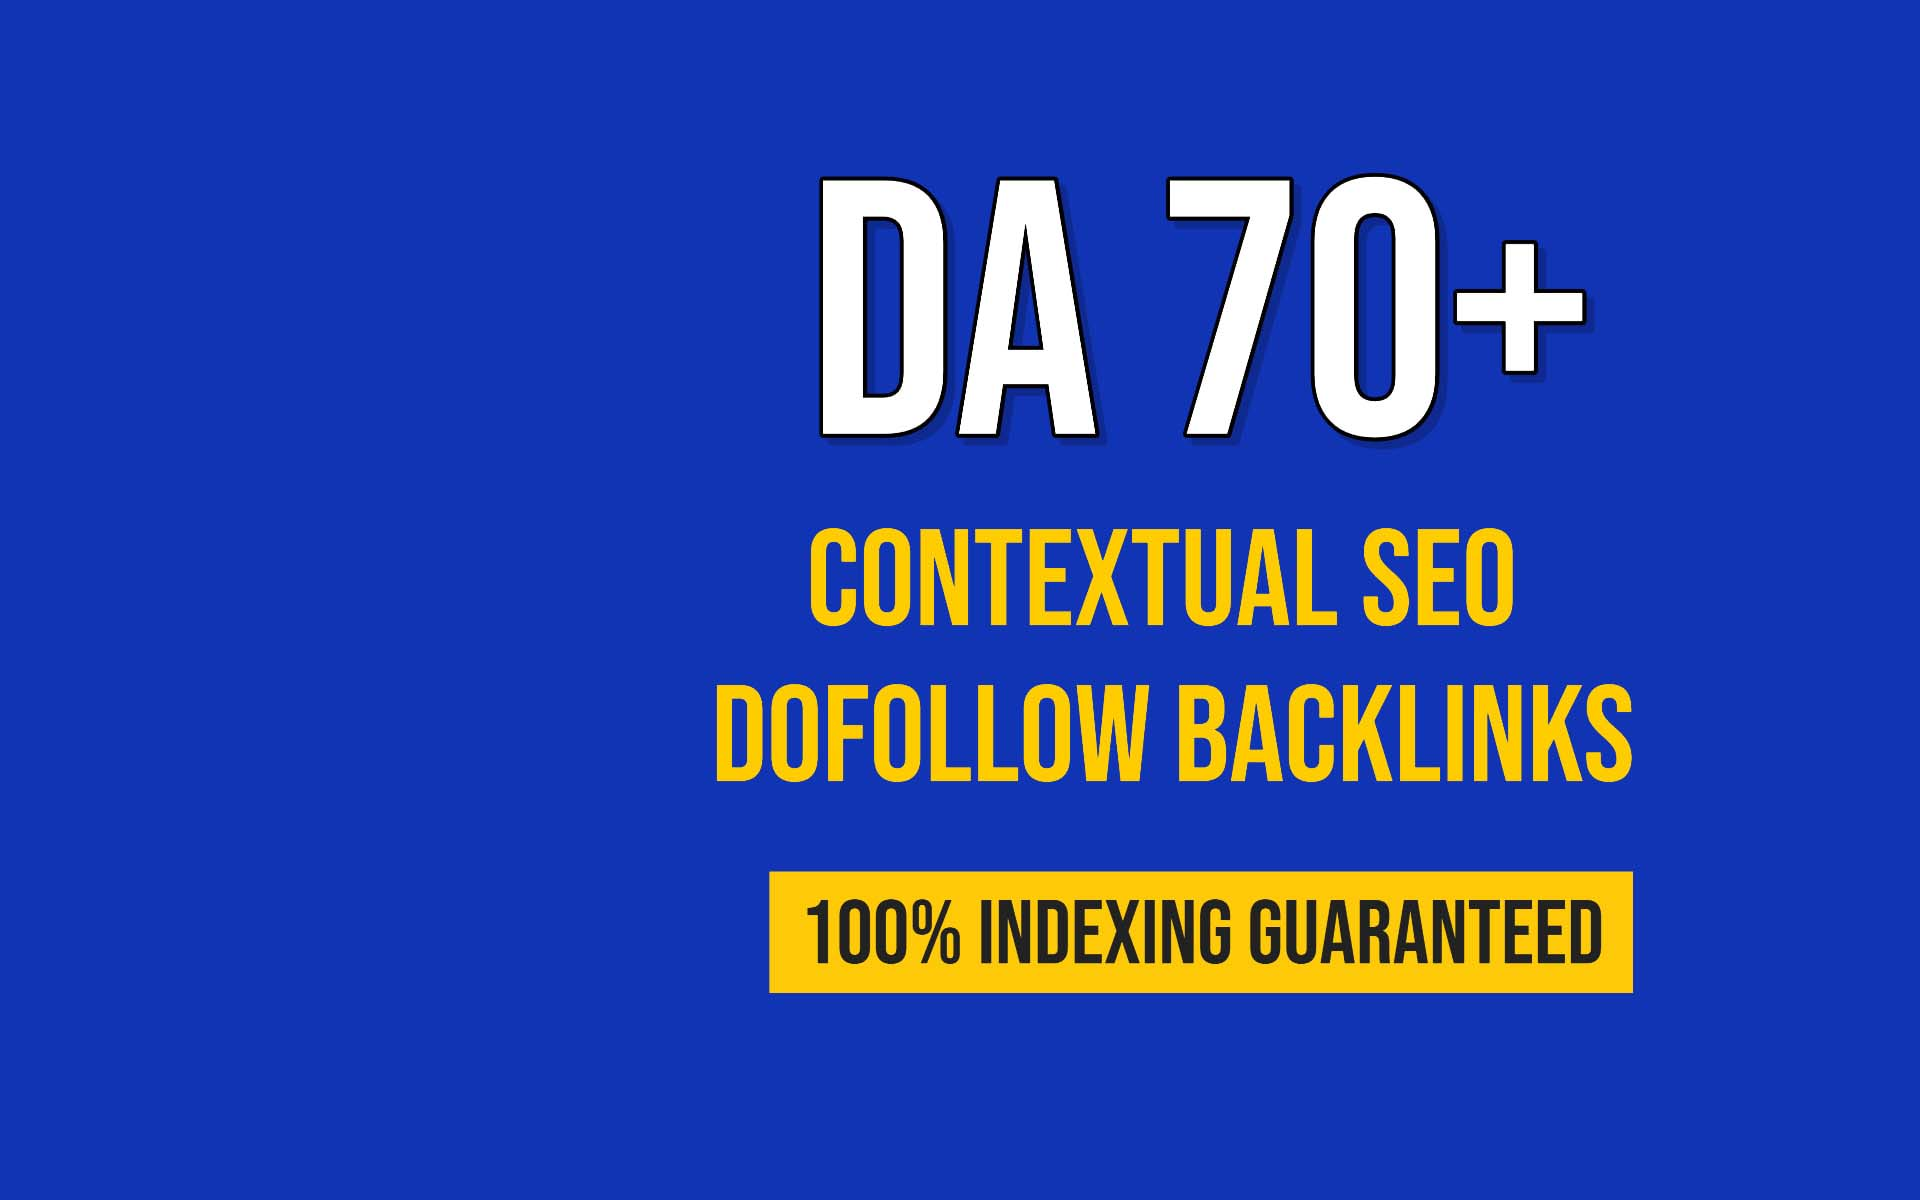 I will created 500 high quality contextual SEO dofollow backlinks